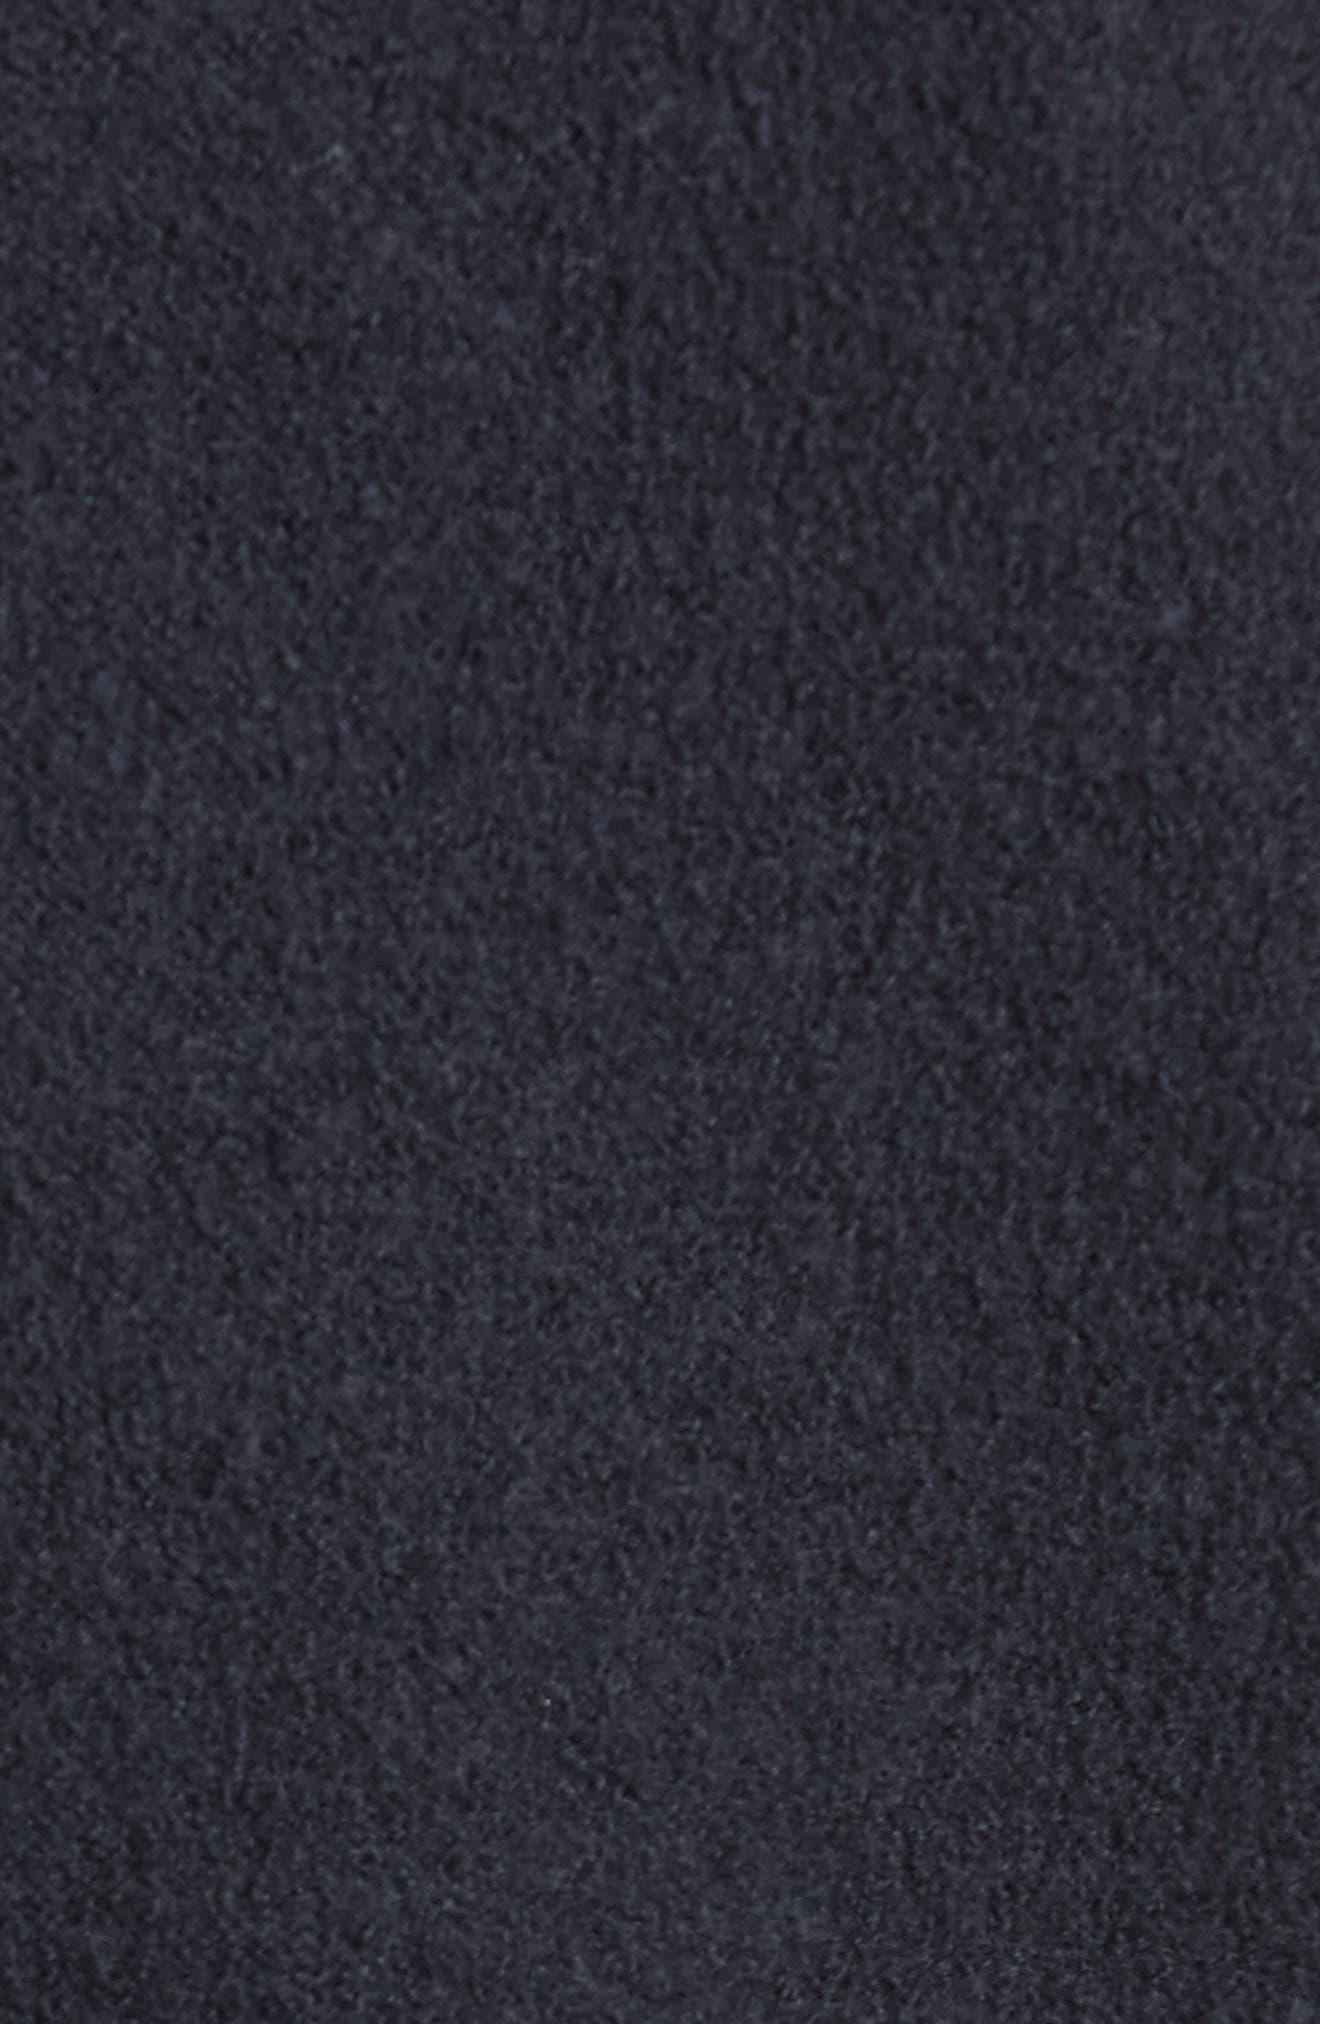 Armani Jeans Single Button Wool Coat,                             Alternate thumbnail 6, color,                             484